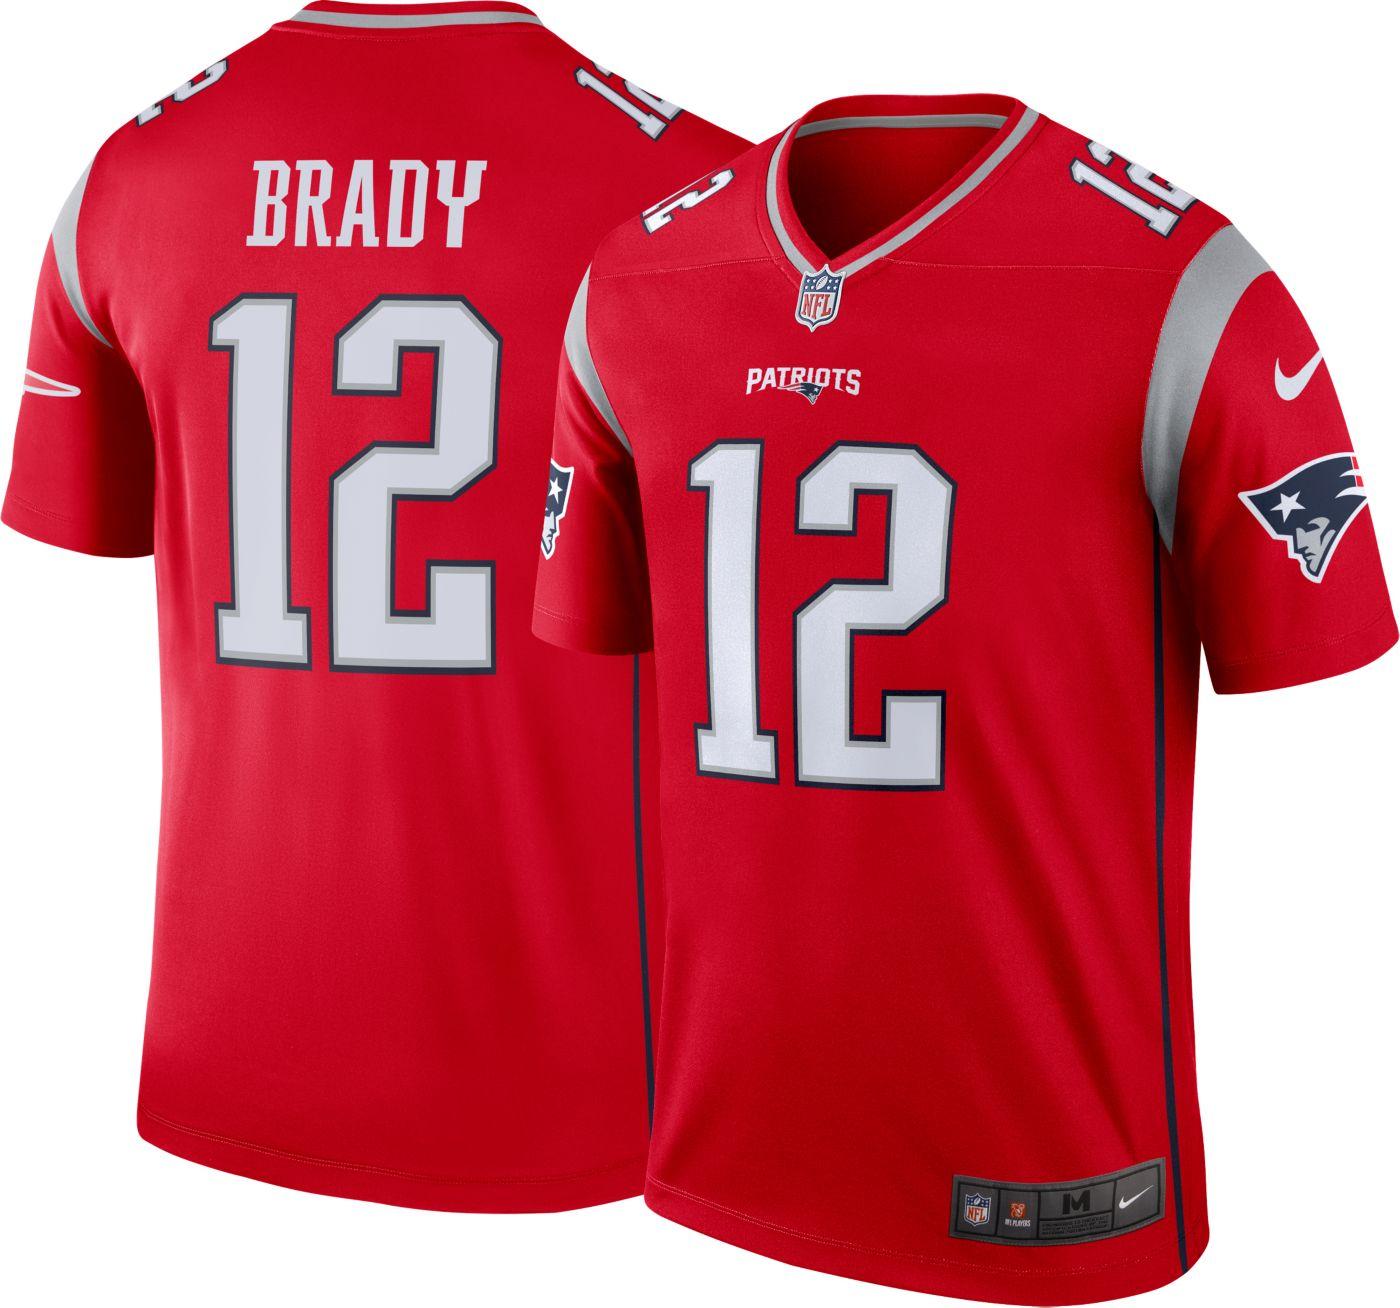 Nike Men's Alternate Legend Jersey New England Patriots Tom Brady #12